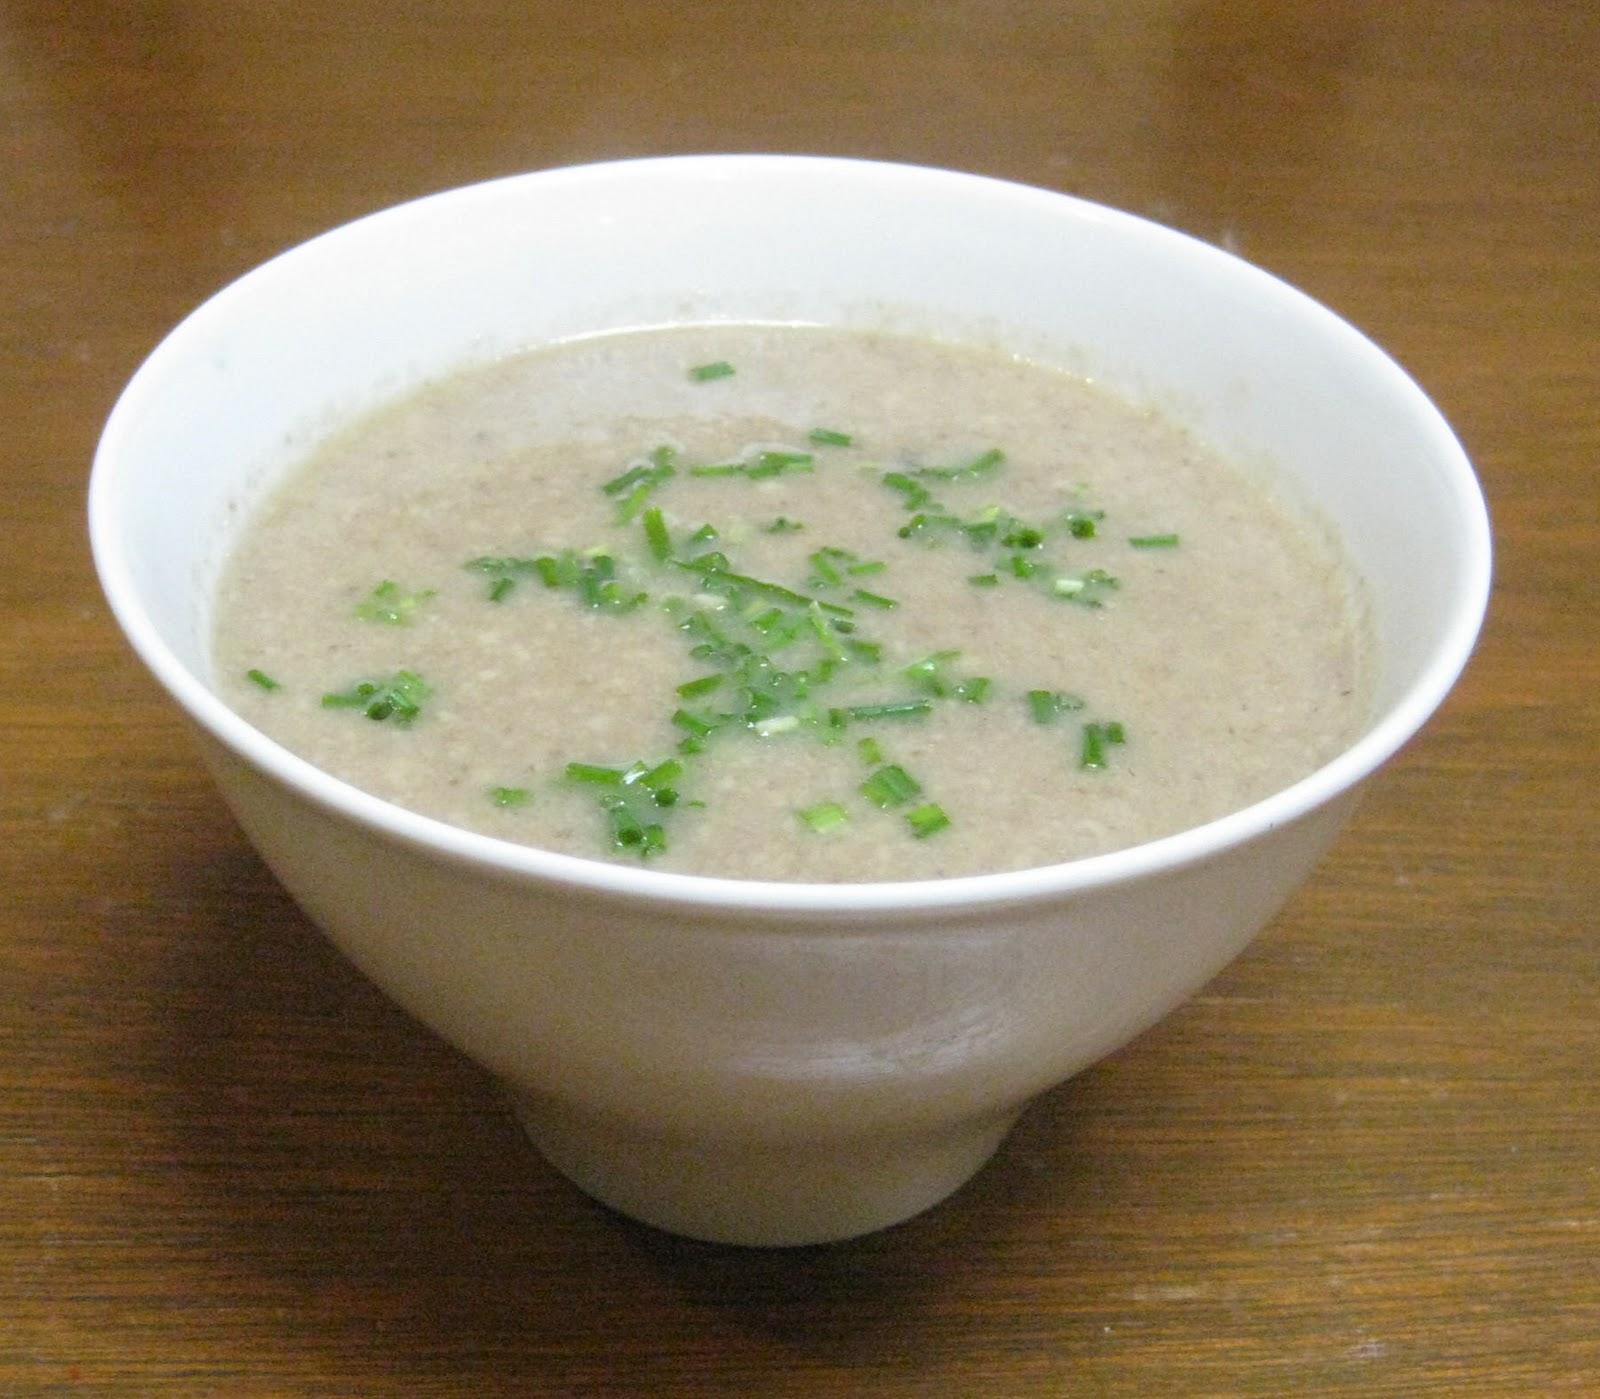 Flavors of the Sun: Anthony Bourdain's Mushroom Soup